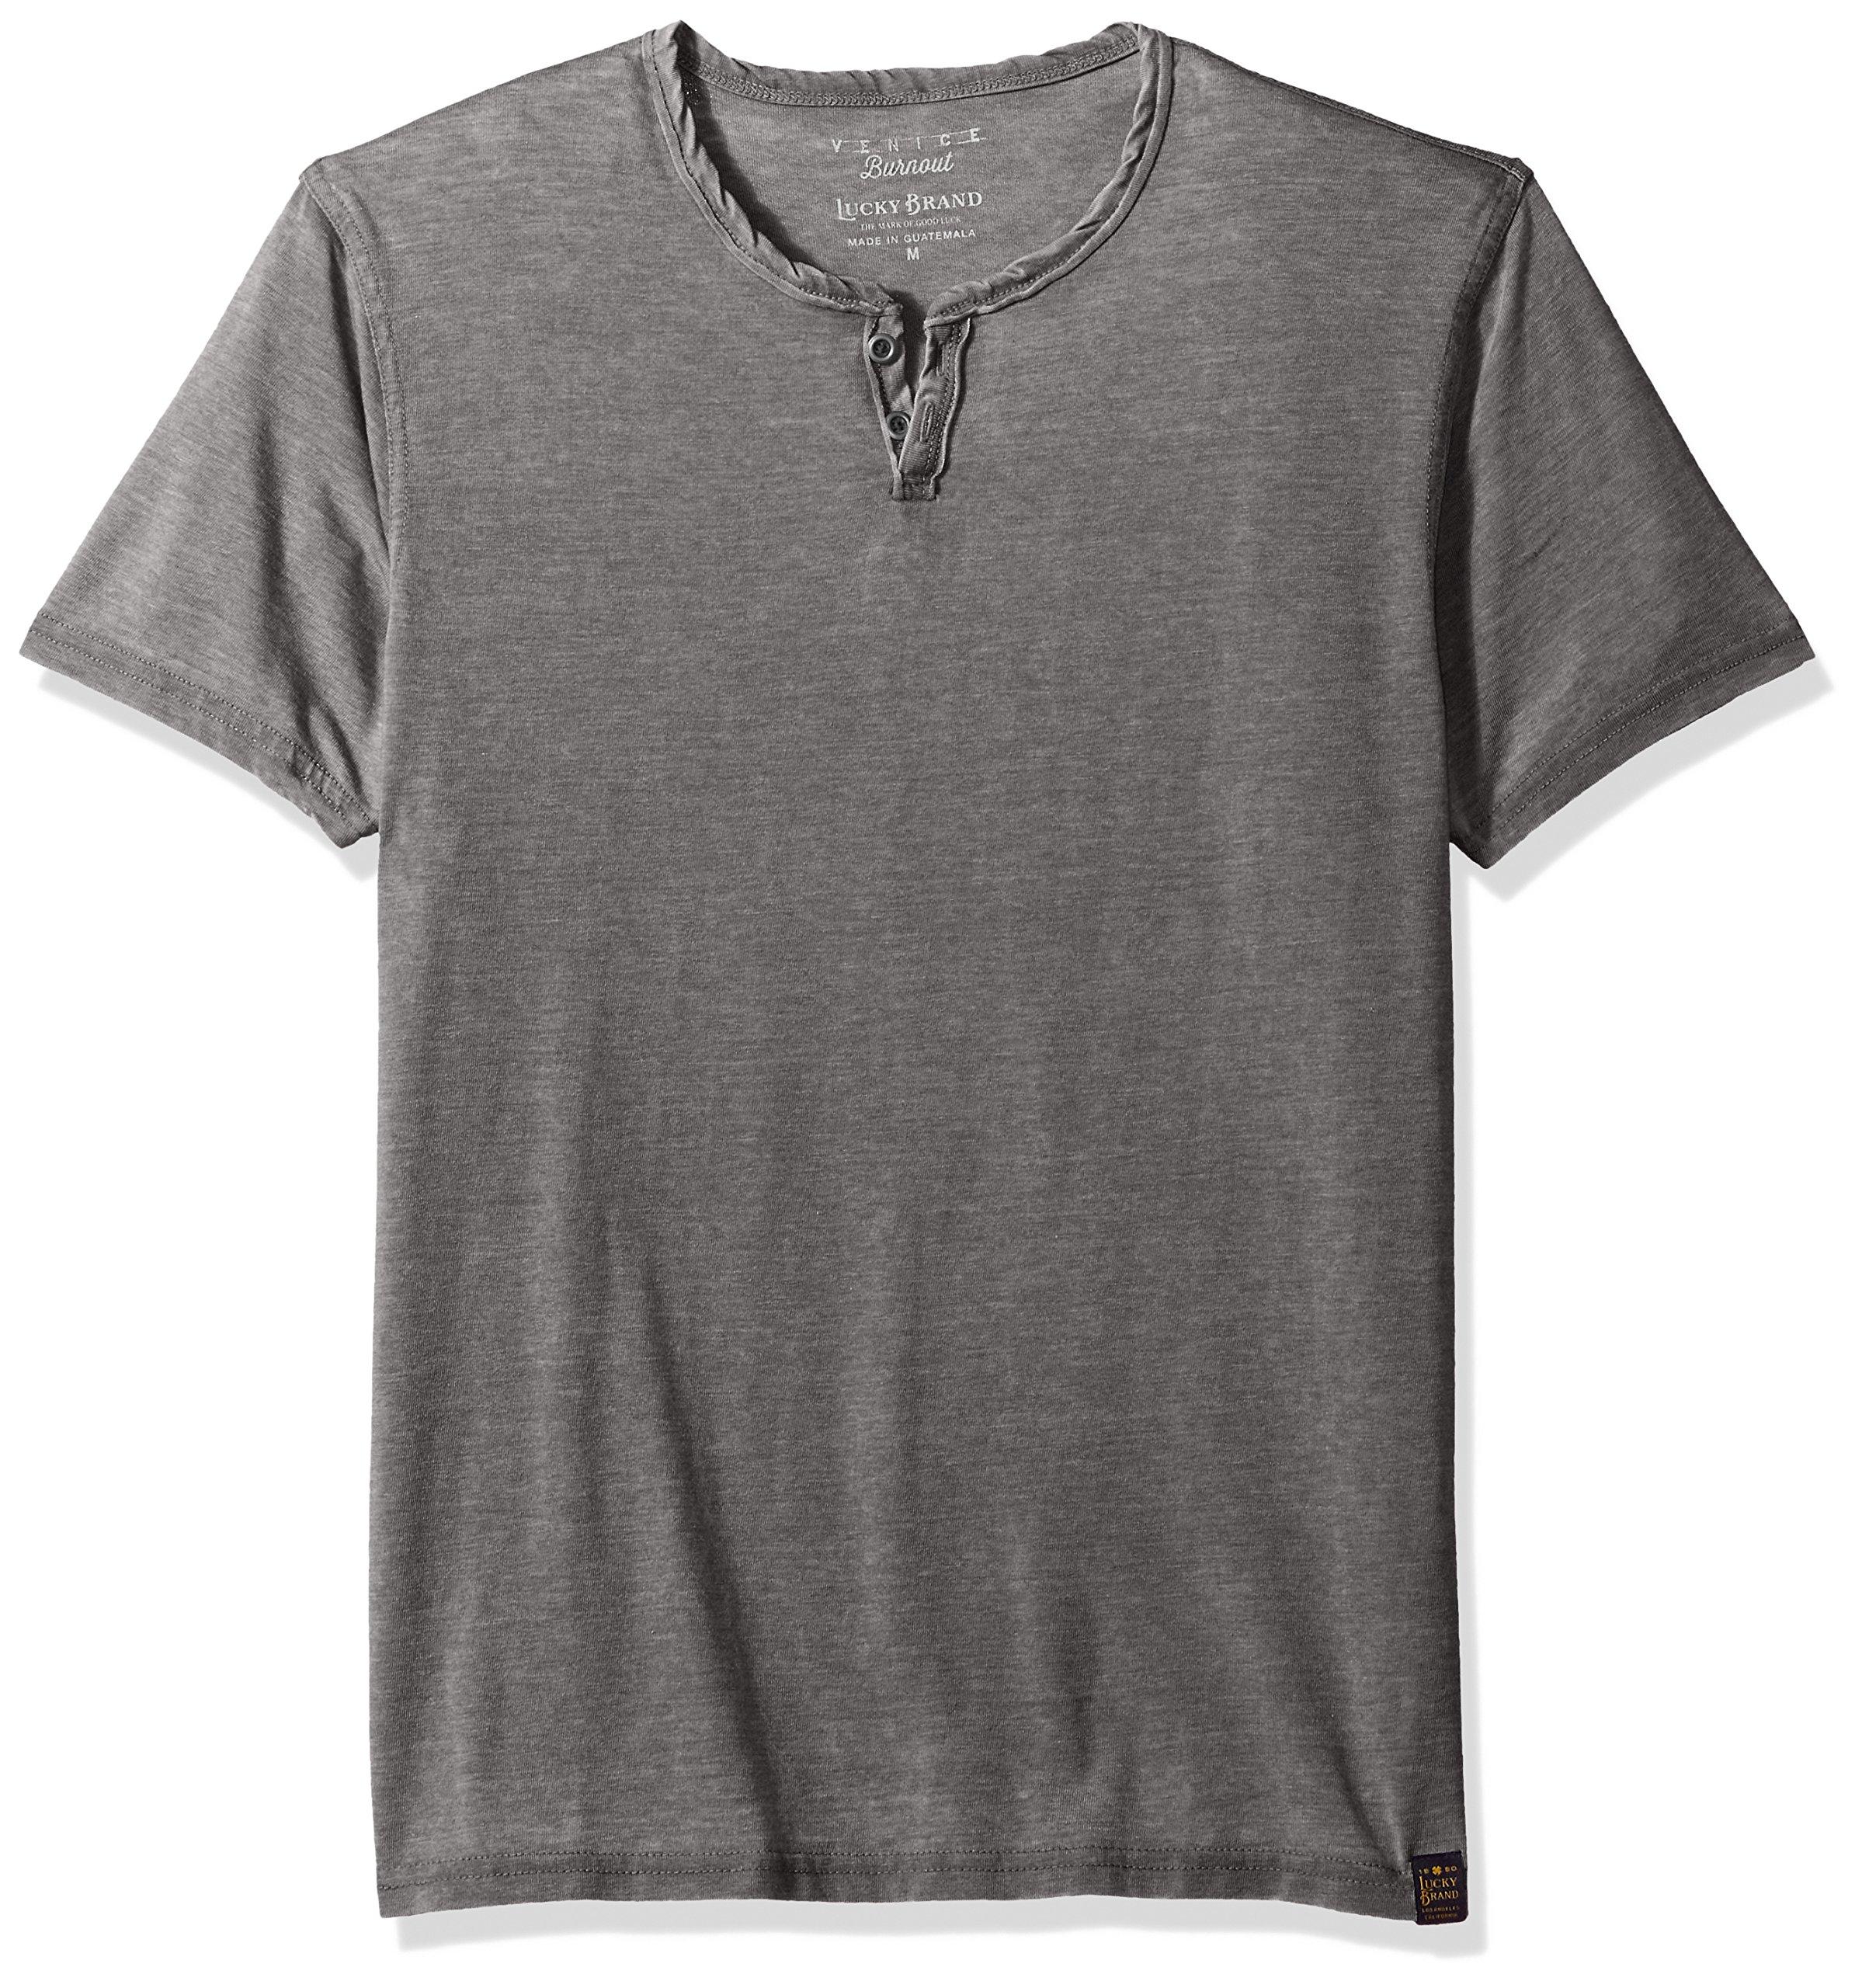 Lucky Brand Men's Venice Burnout Notch Neck Tee Shirt, Black Mountain, L